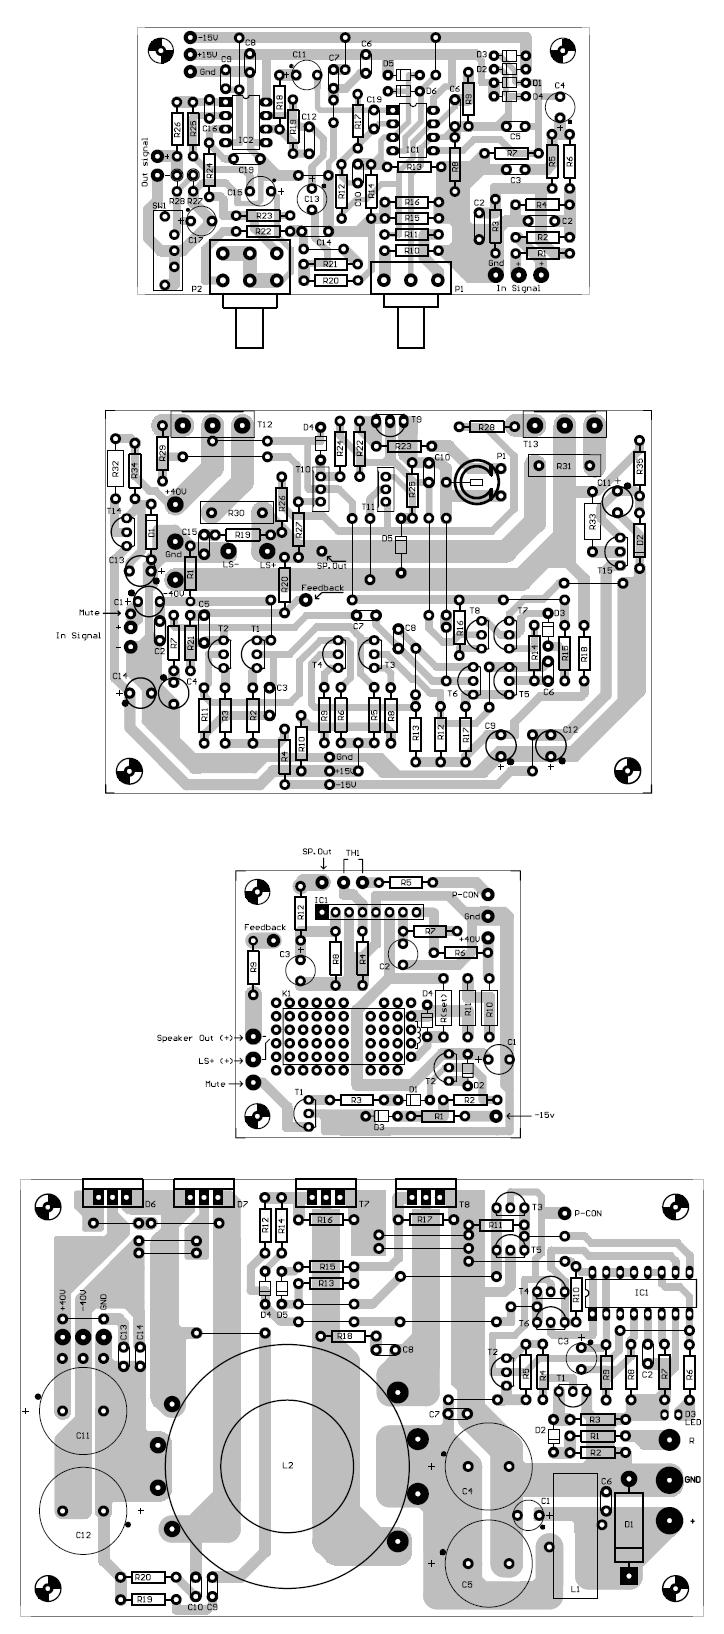 power-amplifier-bass-preamplifier-dc-dc-converter-smps-protection-circuit